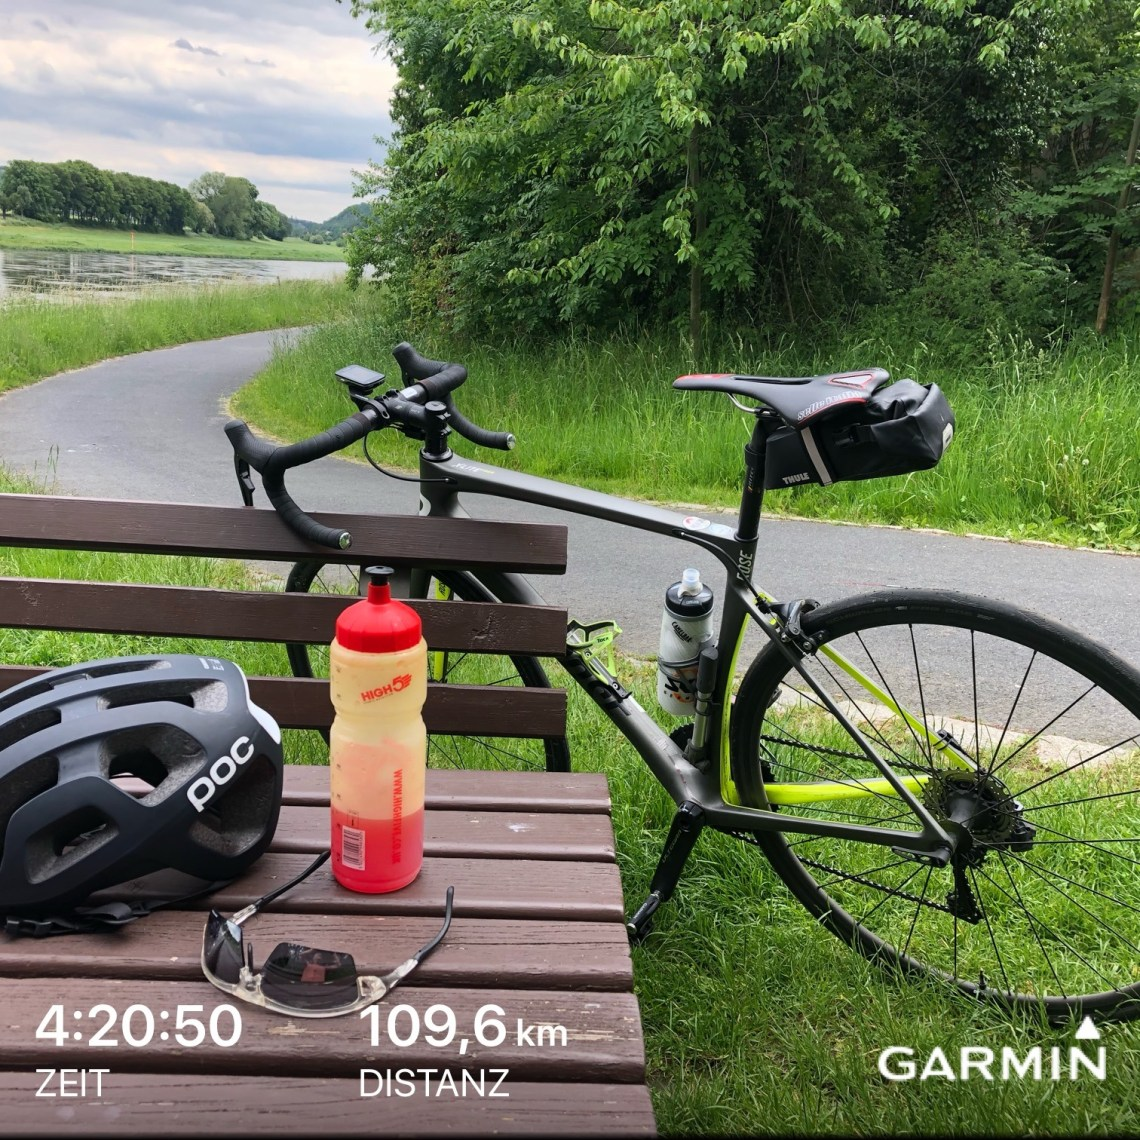 iamcycling-roadbike trip Nossen 27.05.2019